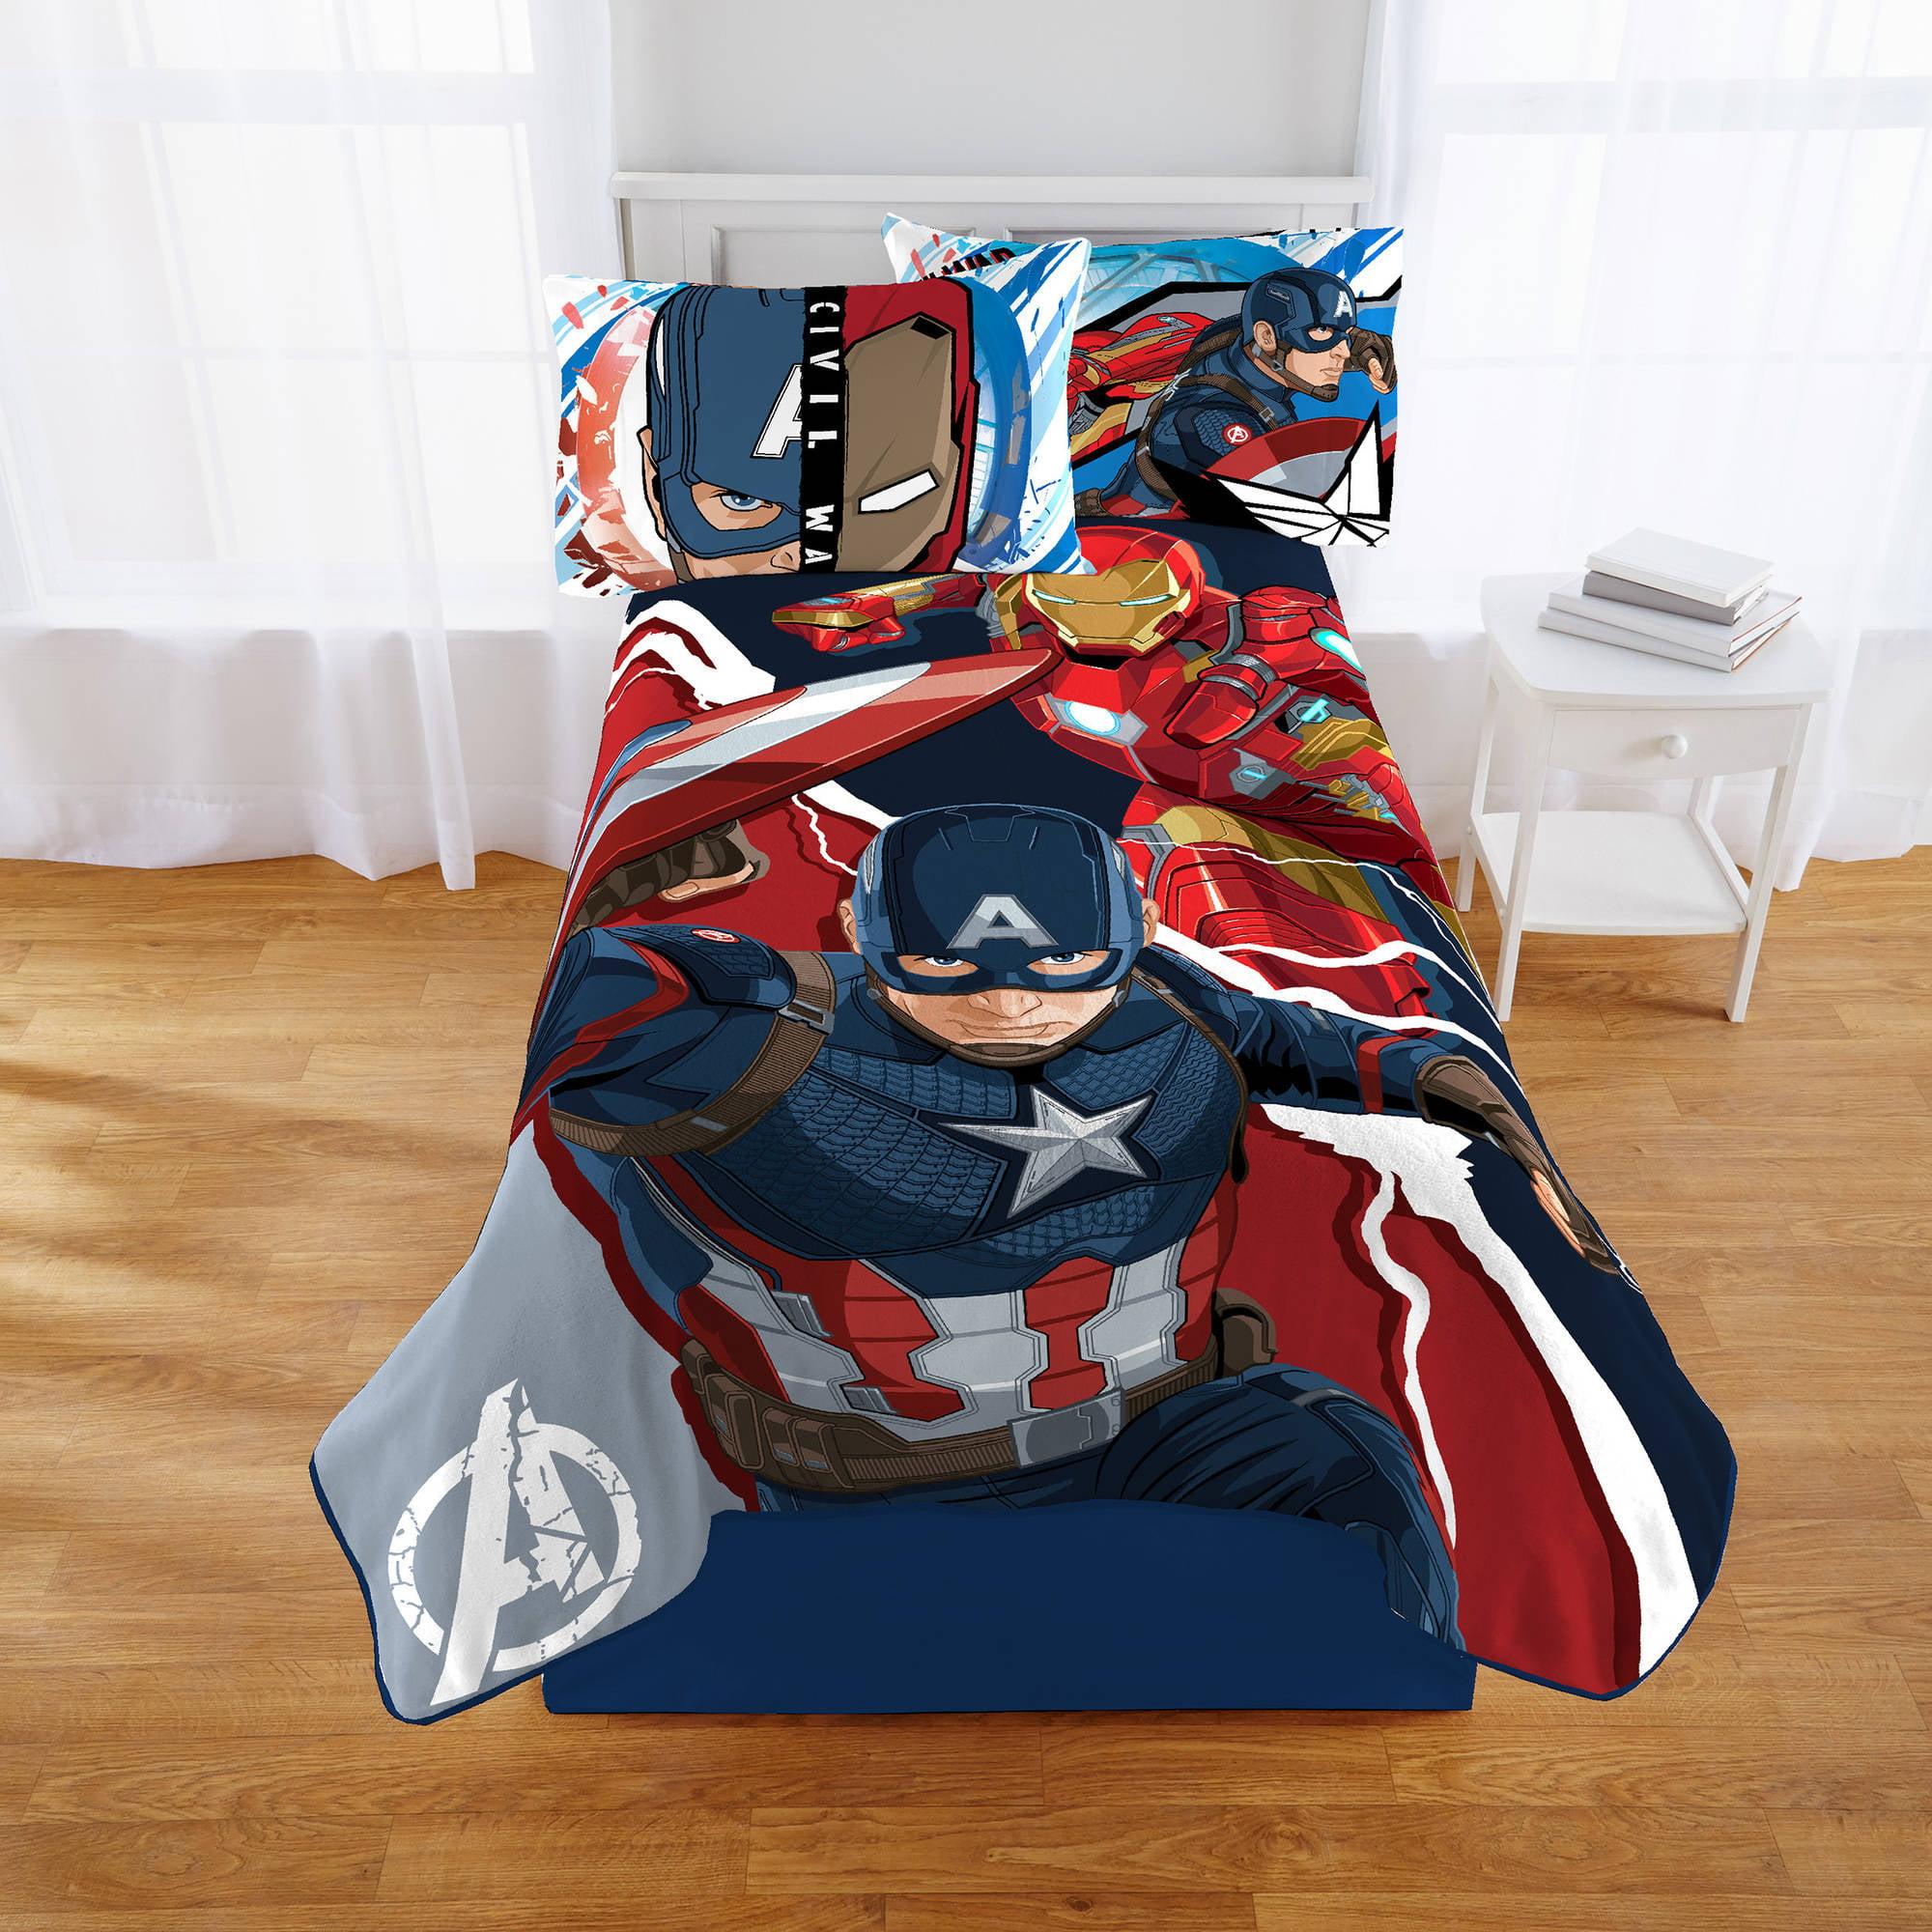 Spiderman bedding walmart - Spiderman Bedding Walmart 23